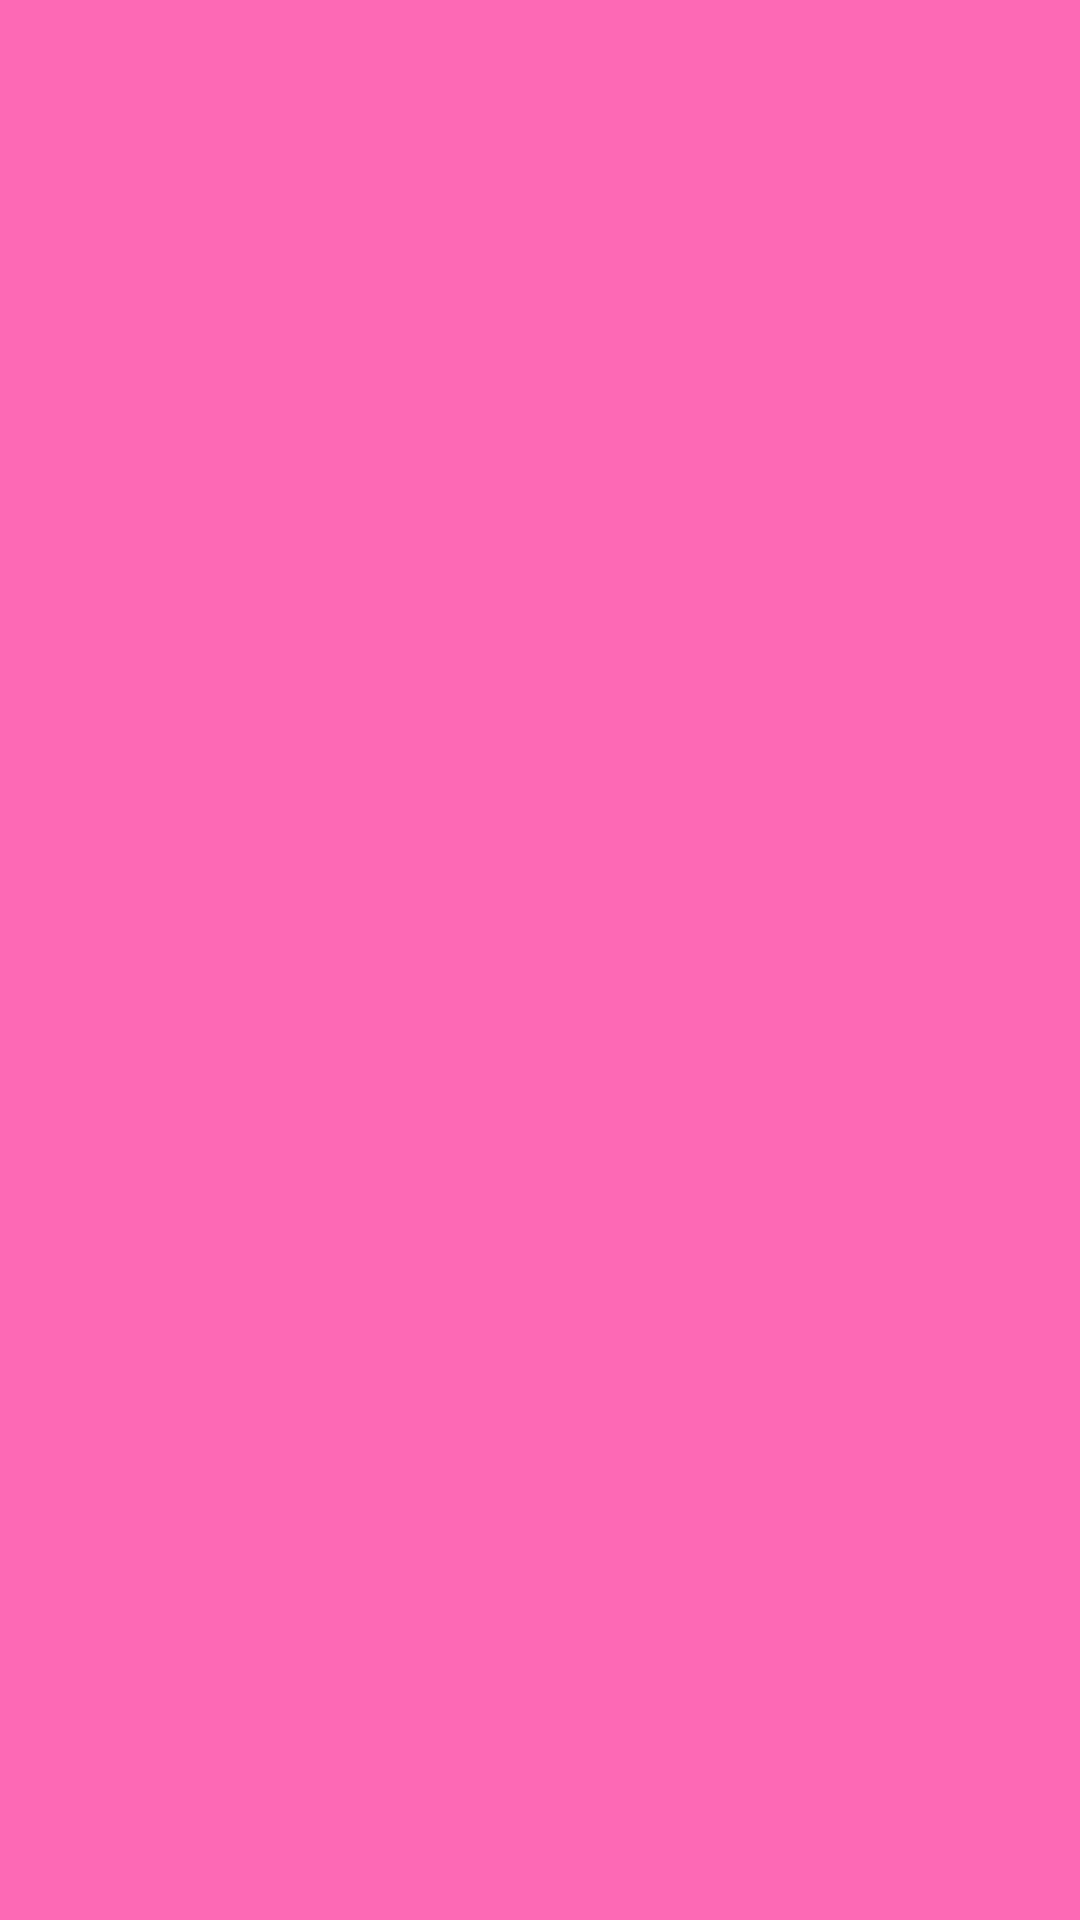 Plain Baby Pink Wallpaper Iphone Djiwallpaperco